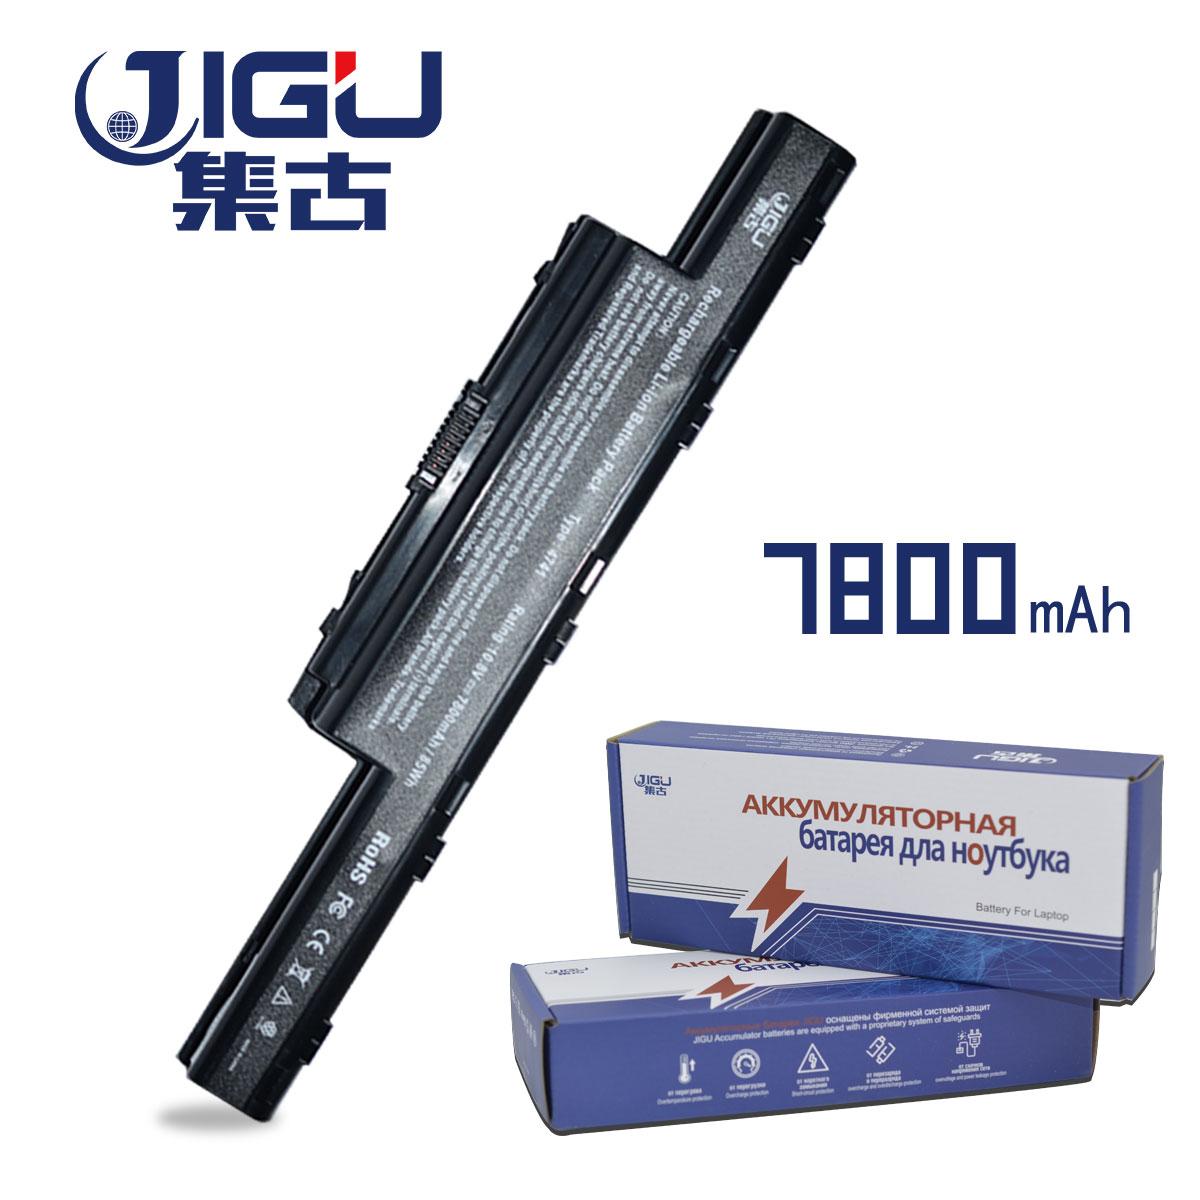 JIGU 9 Cells Battery AS10D31 AS10D41 AS10D51 For Acer Aspire 5736Z 5741 5741G 5741Z 5742 5742G 5742Z 5742ZG 5750G